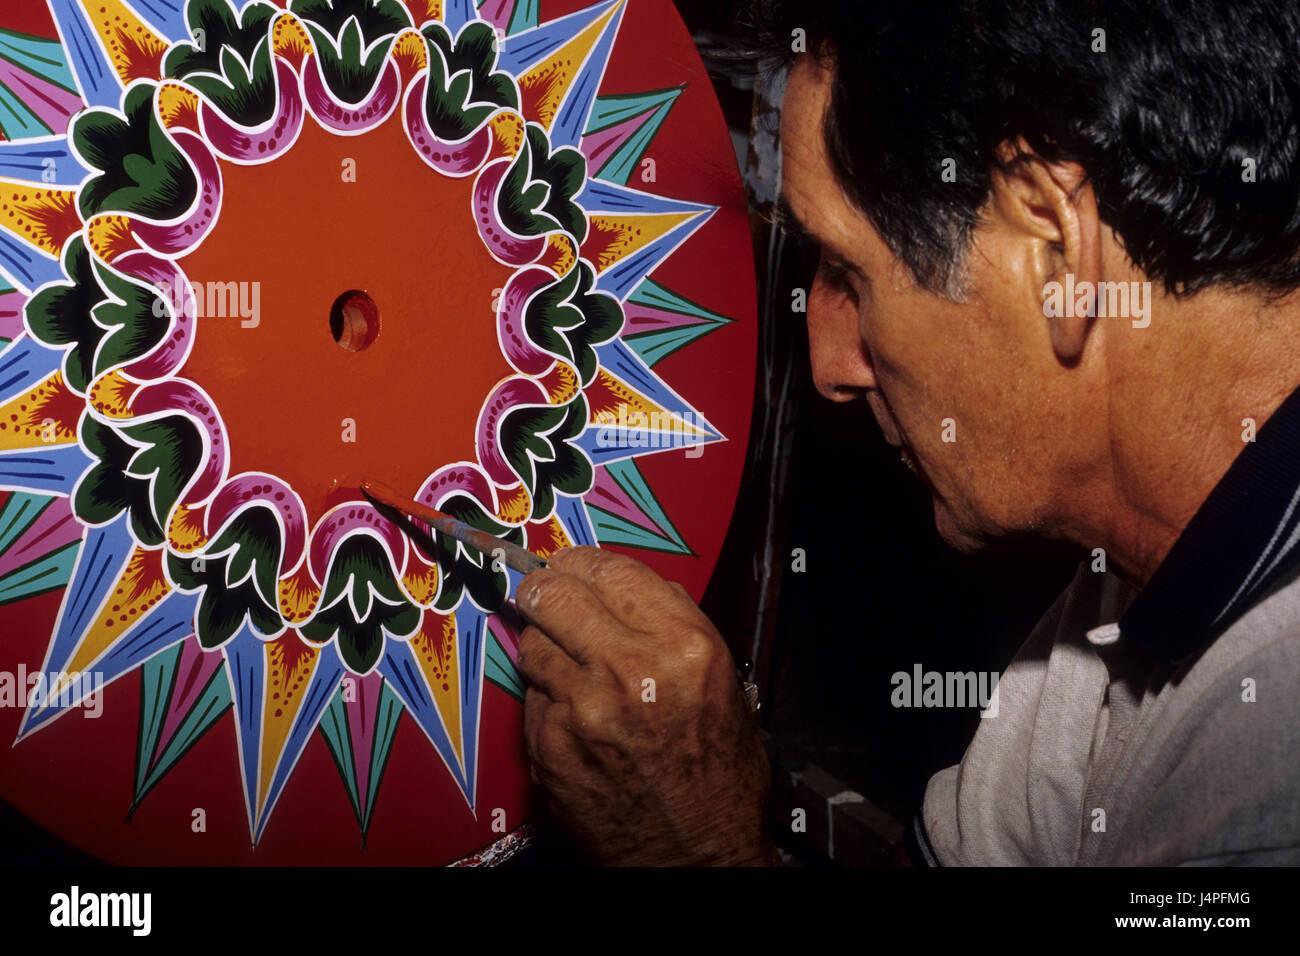 Costa Rica, Sarchi, man paints ox's carts, - Stock Image